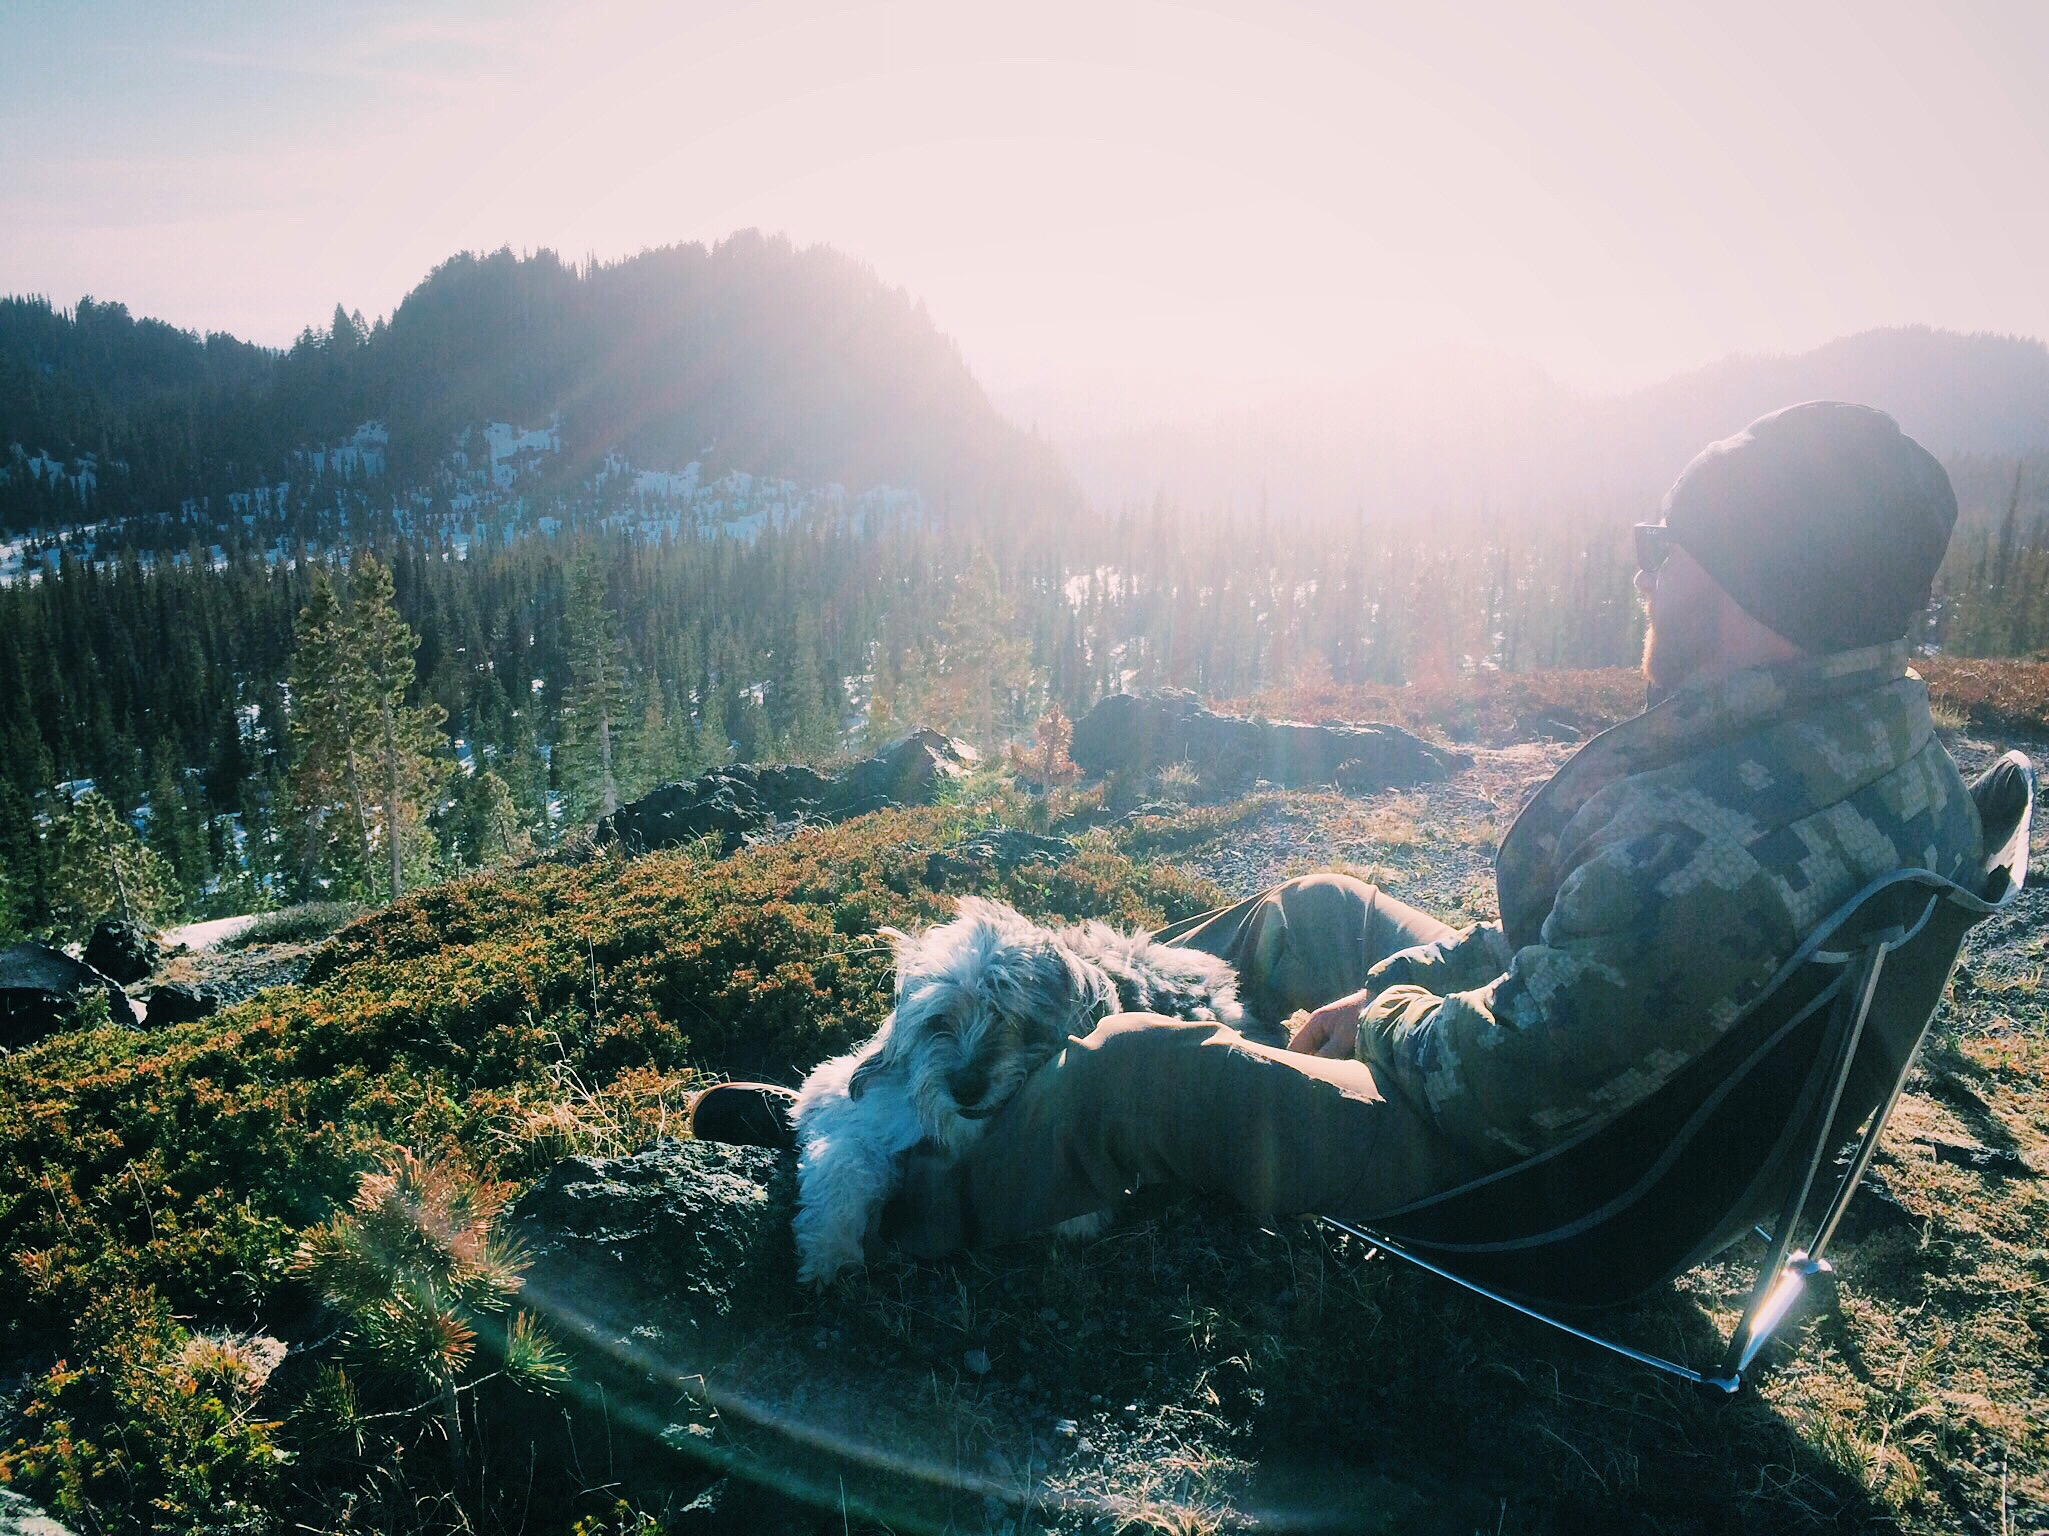 Kuiu Teton Insulated Jacket By Land